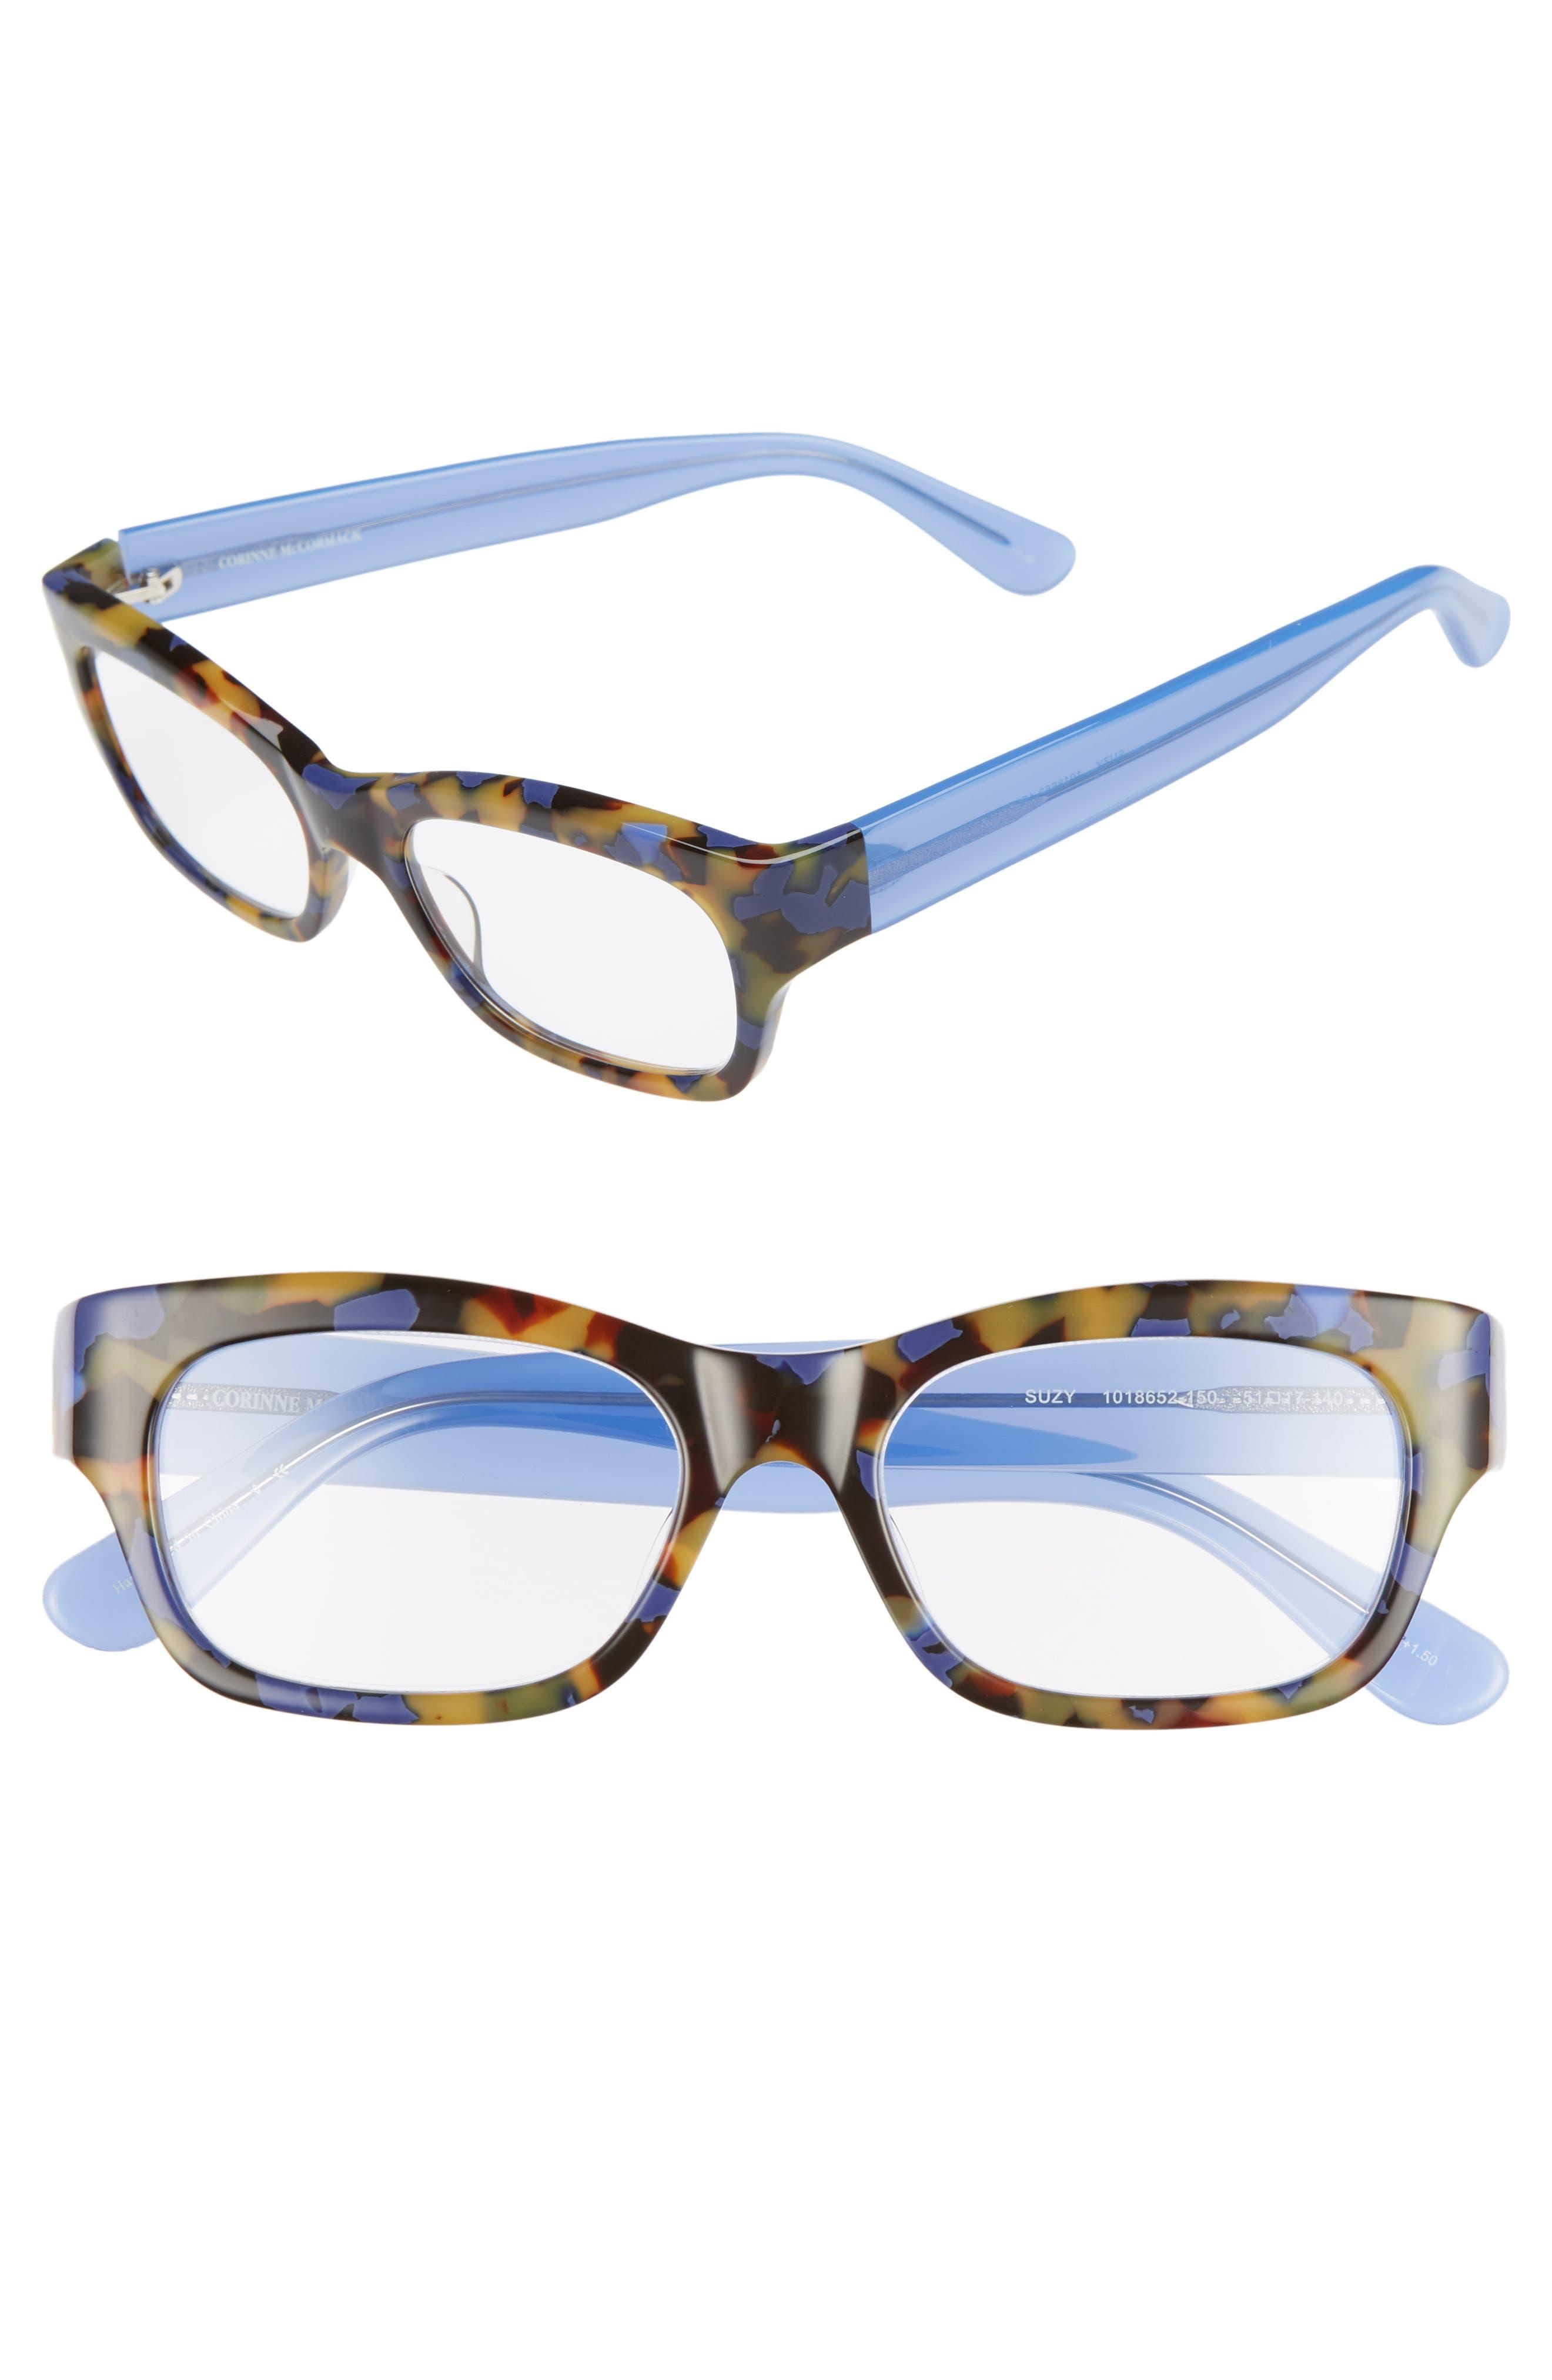 Suzy 51mm Reading Glasses,                             Main thumbnail 1, color,                             TORTOISE BLUE